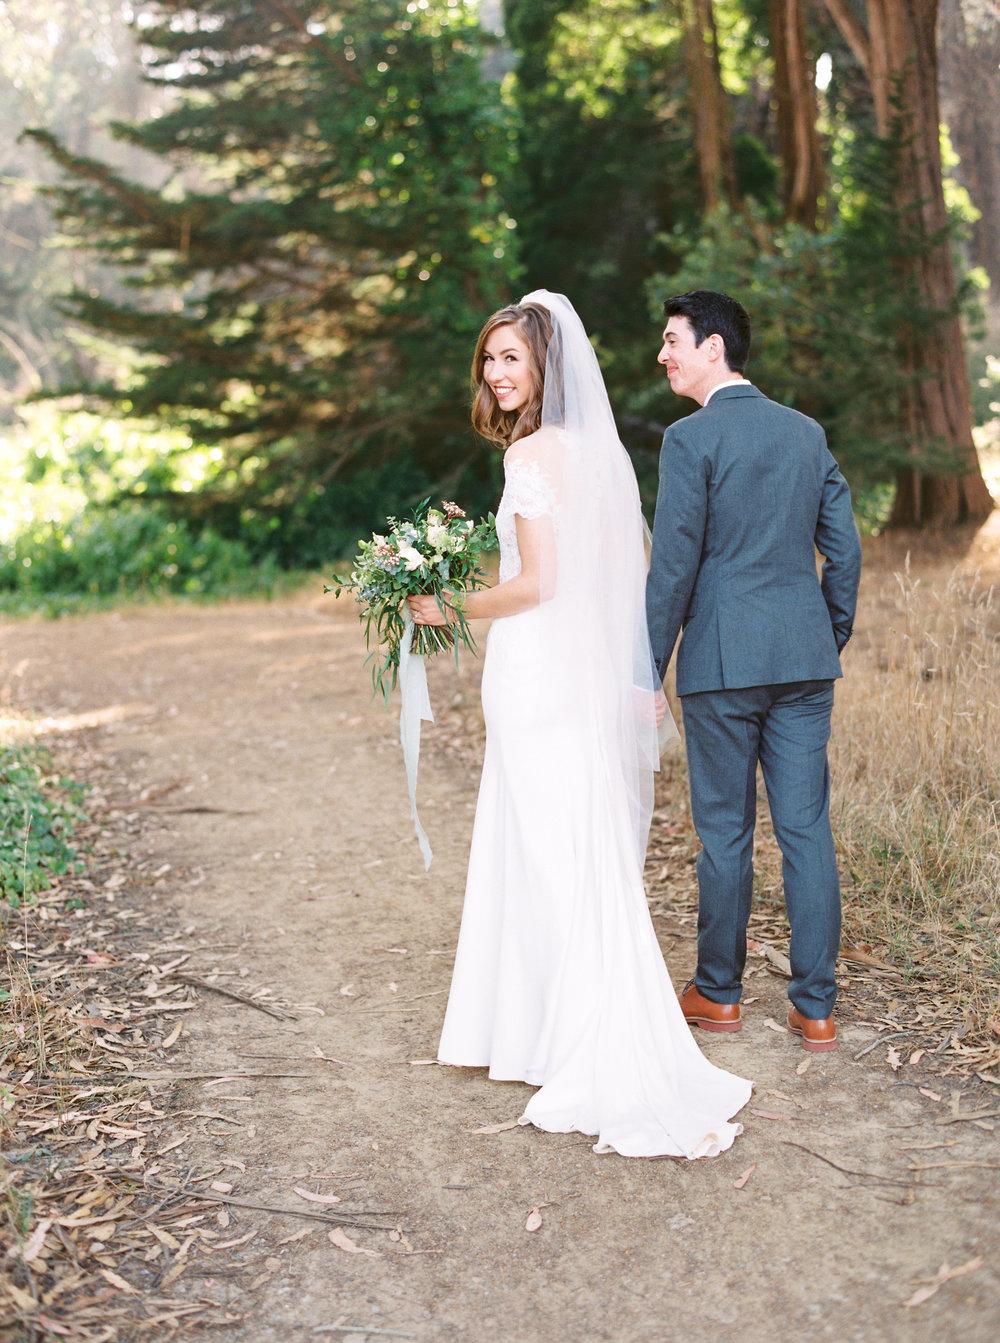 Log-cabin-wedding-in-presidio-san-francisco-california-desintation-wedding-photography-47.jpg